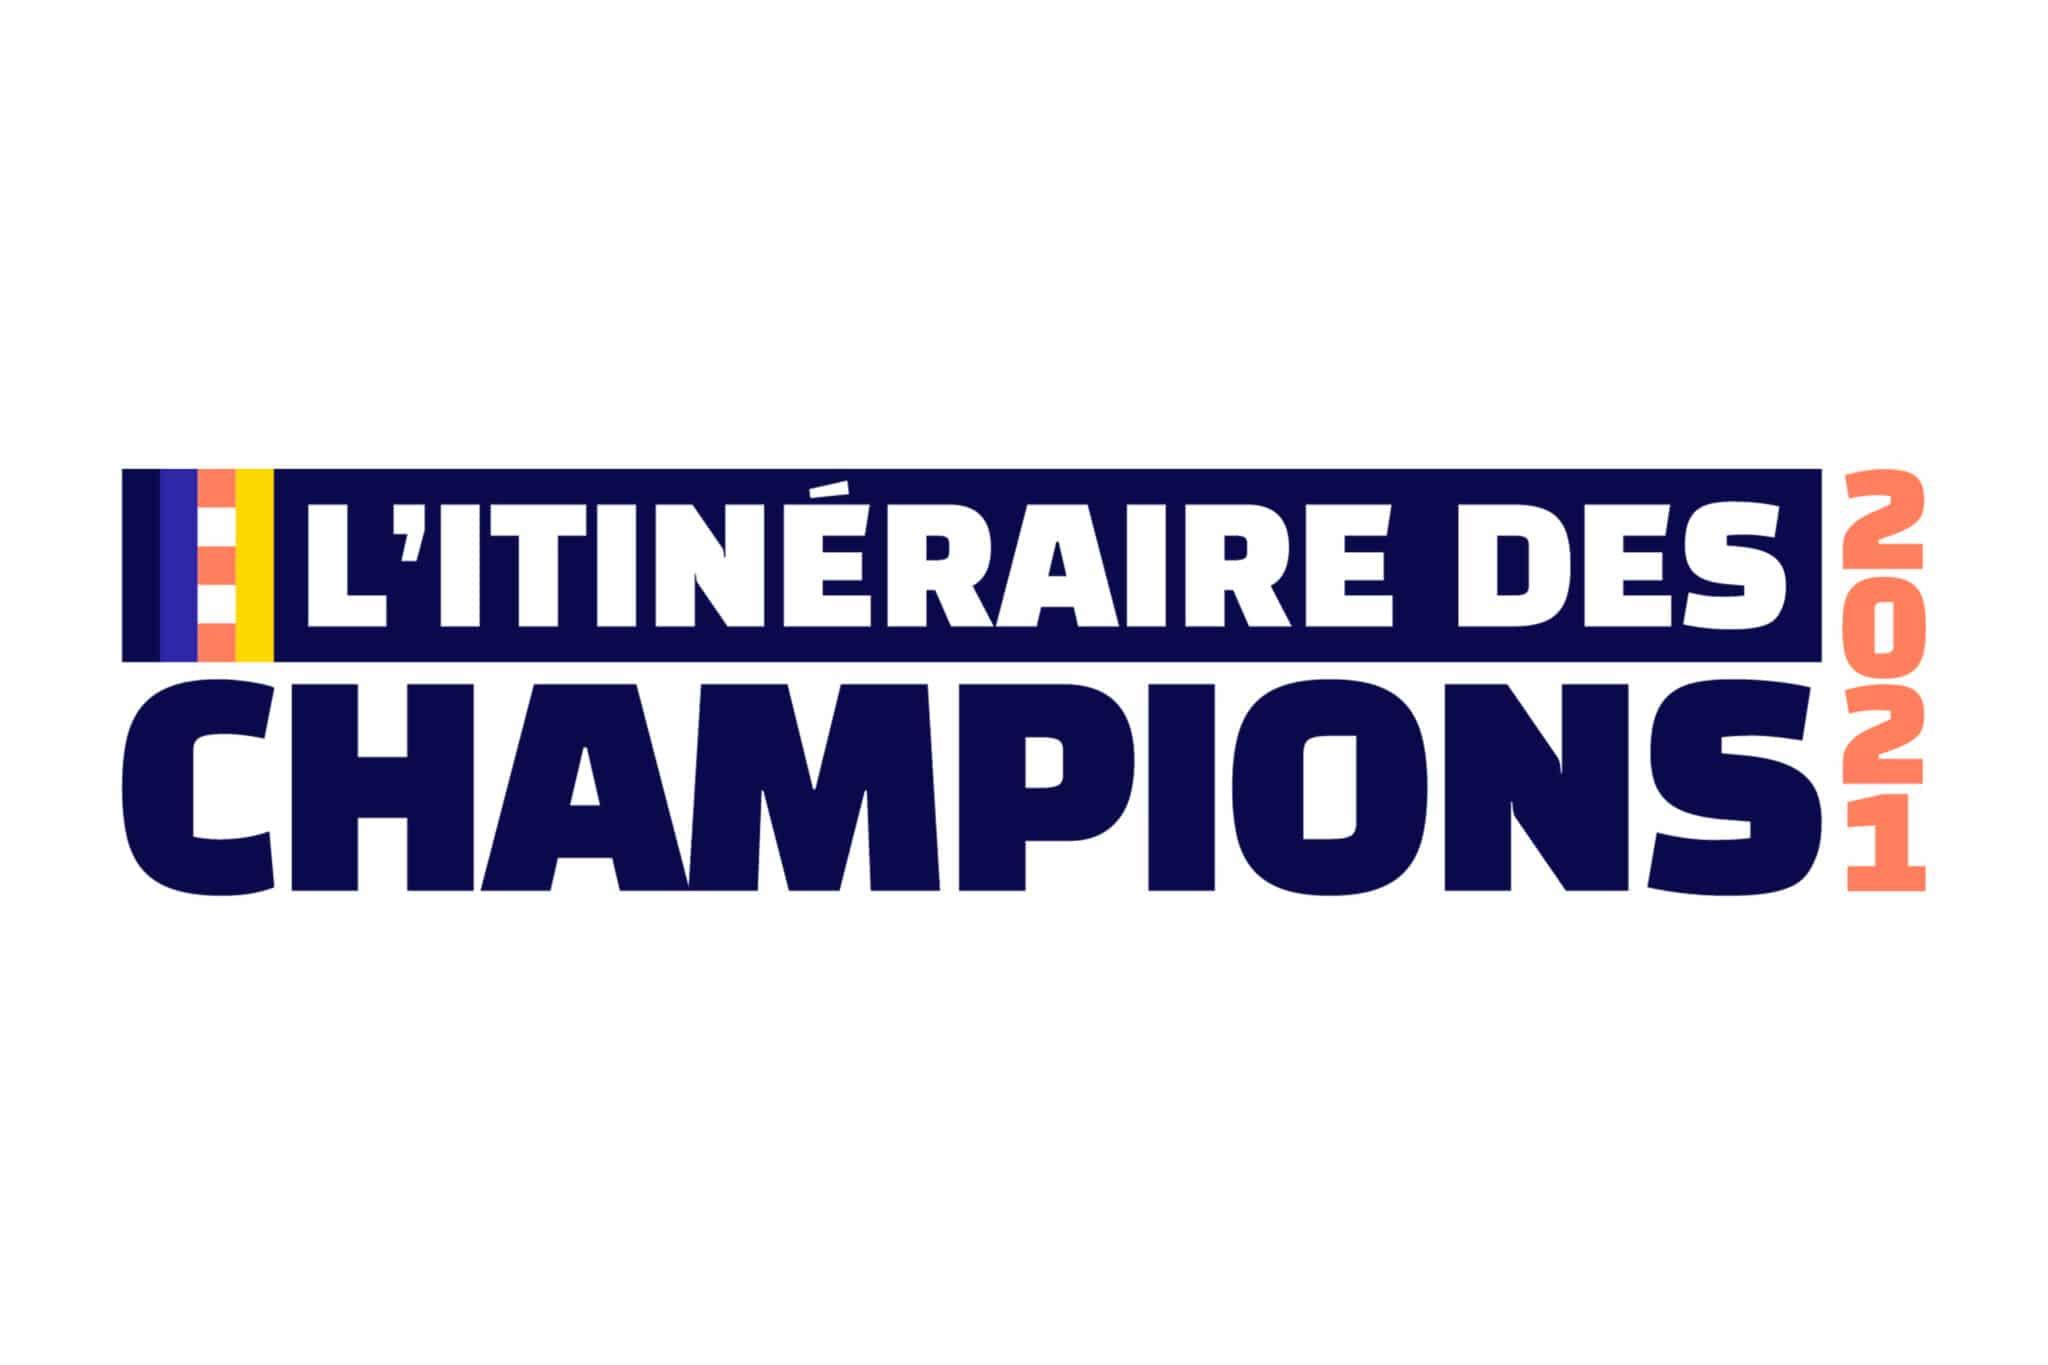 ITINERAIRE DES CHAMPIONS